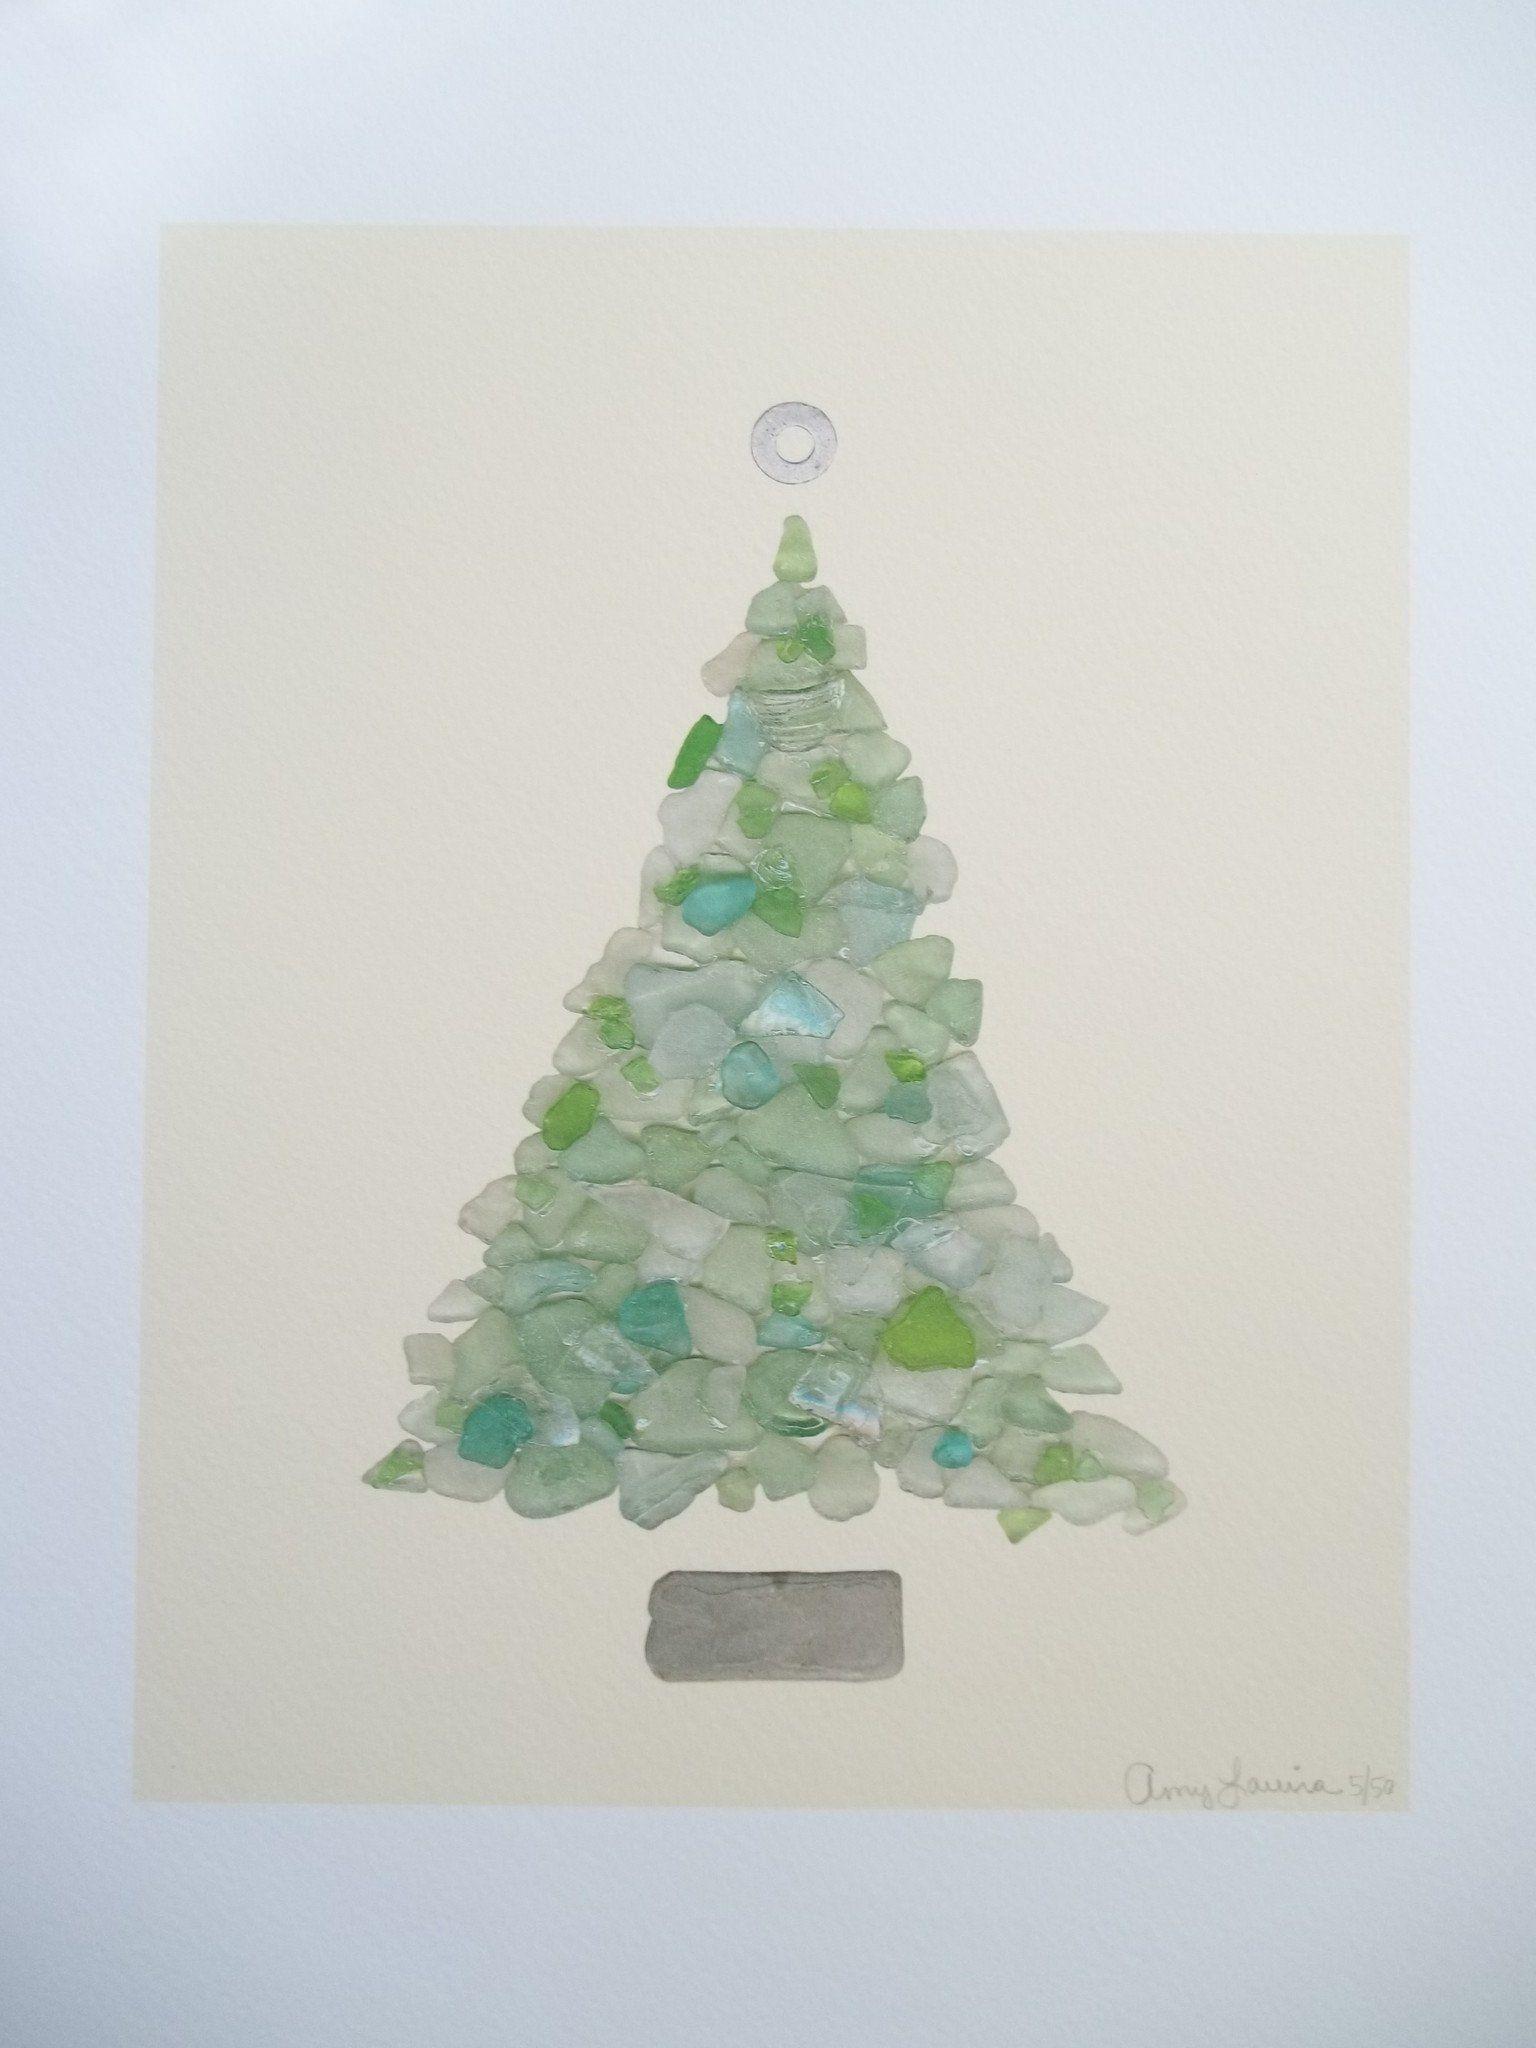 Turquoise Beach Sea Gl Tree 11 X 14 Unframed Print Numbered Signed Seagljewelry Fakeseagl